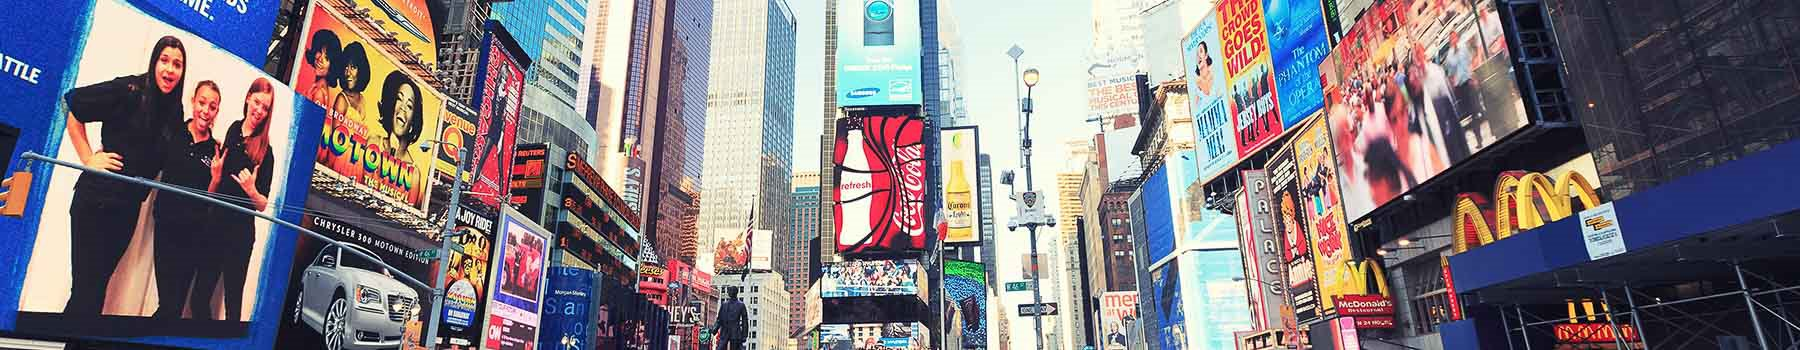 Location of WJ Hotel Newyork